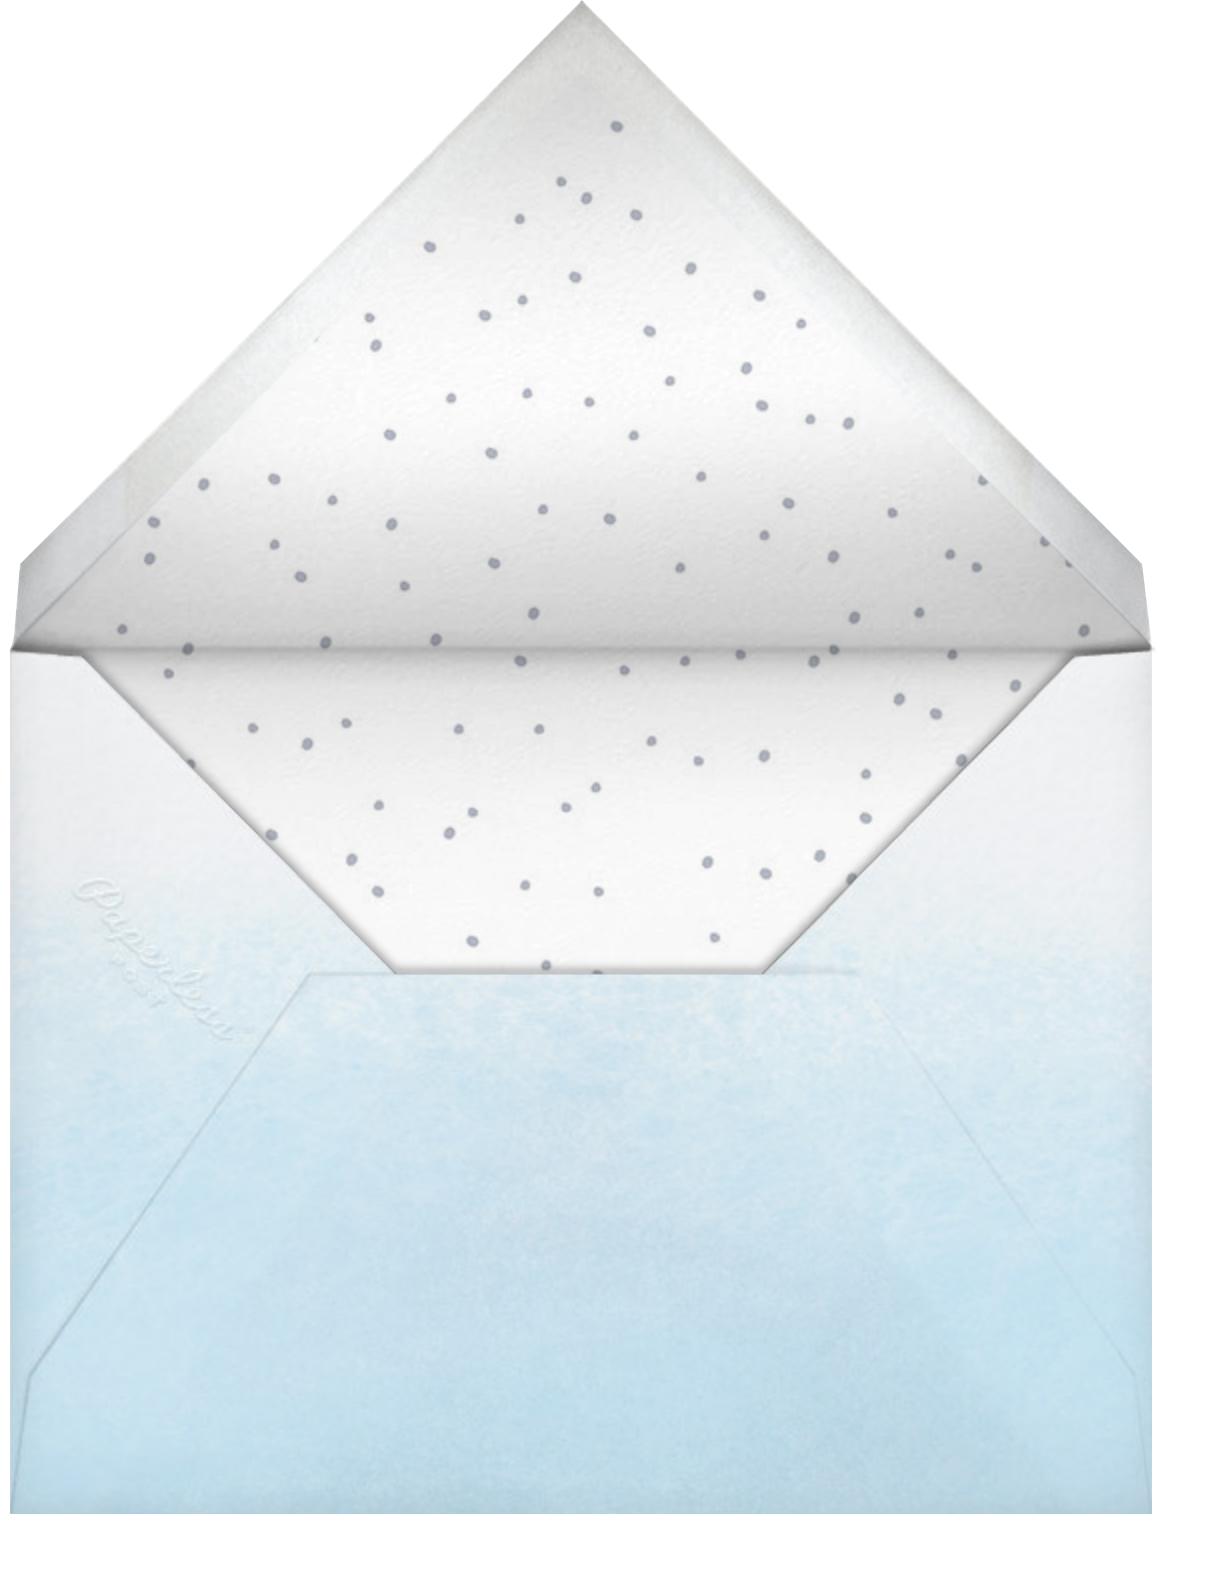 Sprinkle Sprinkle - Hello!Lucky - Envelope